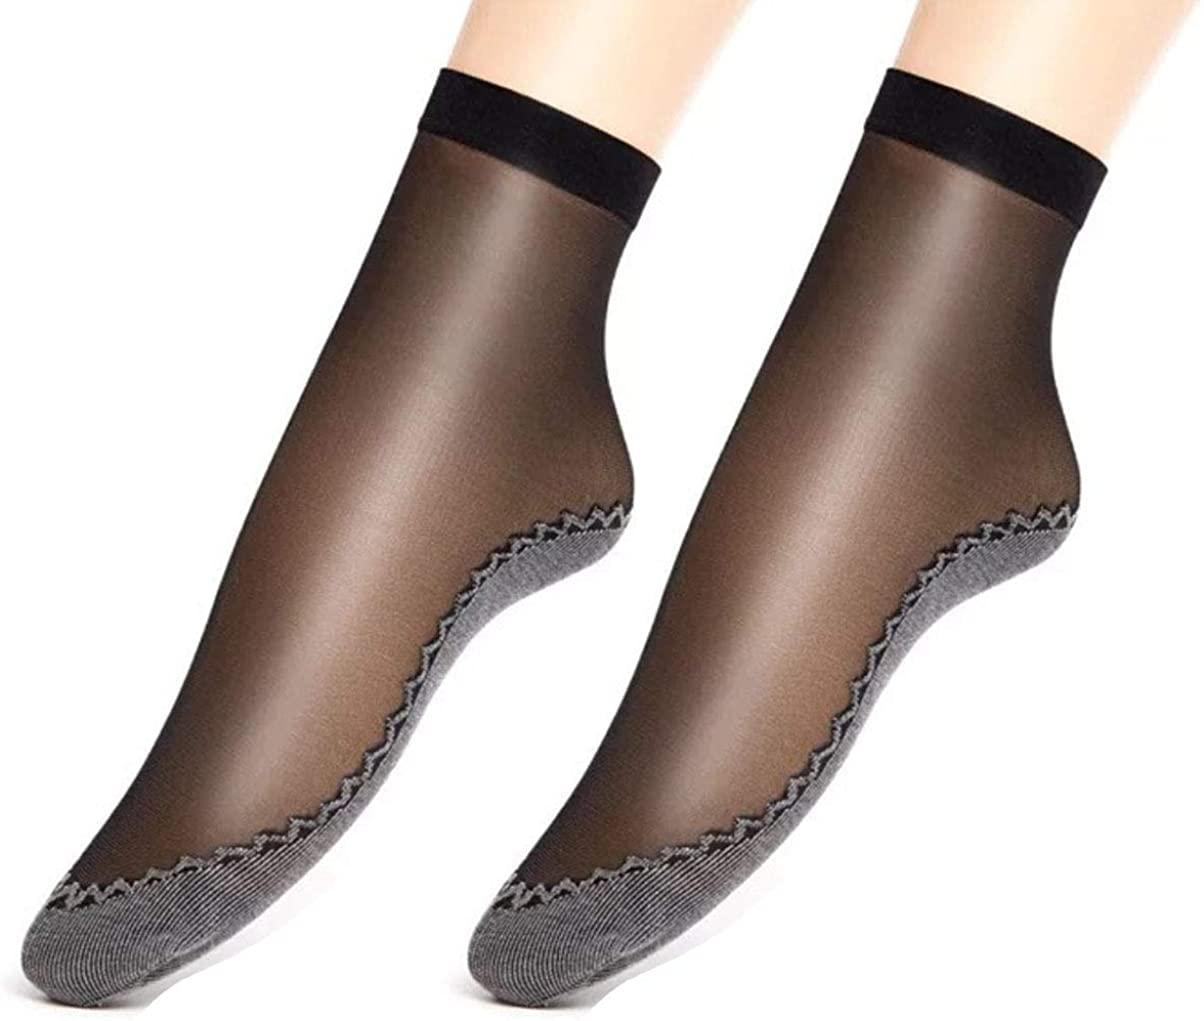 Womens Transparent Socks Sheer Silky Socks See Through Ankle Socks 10 Pairs